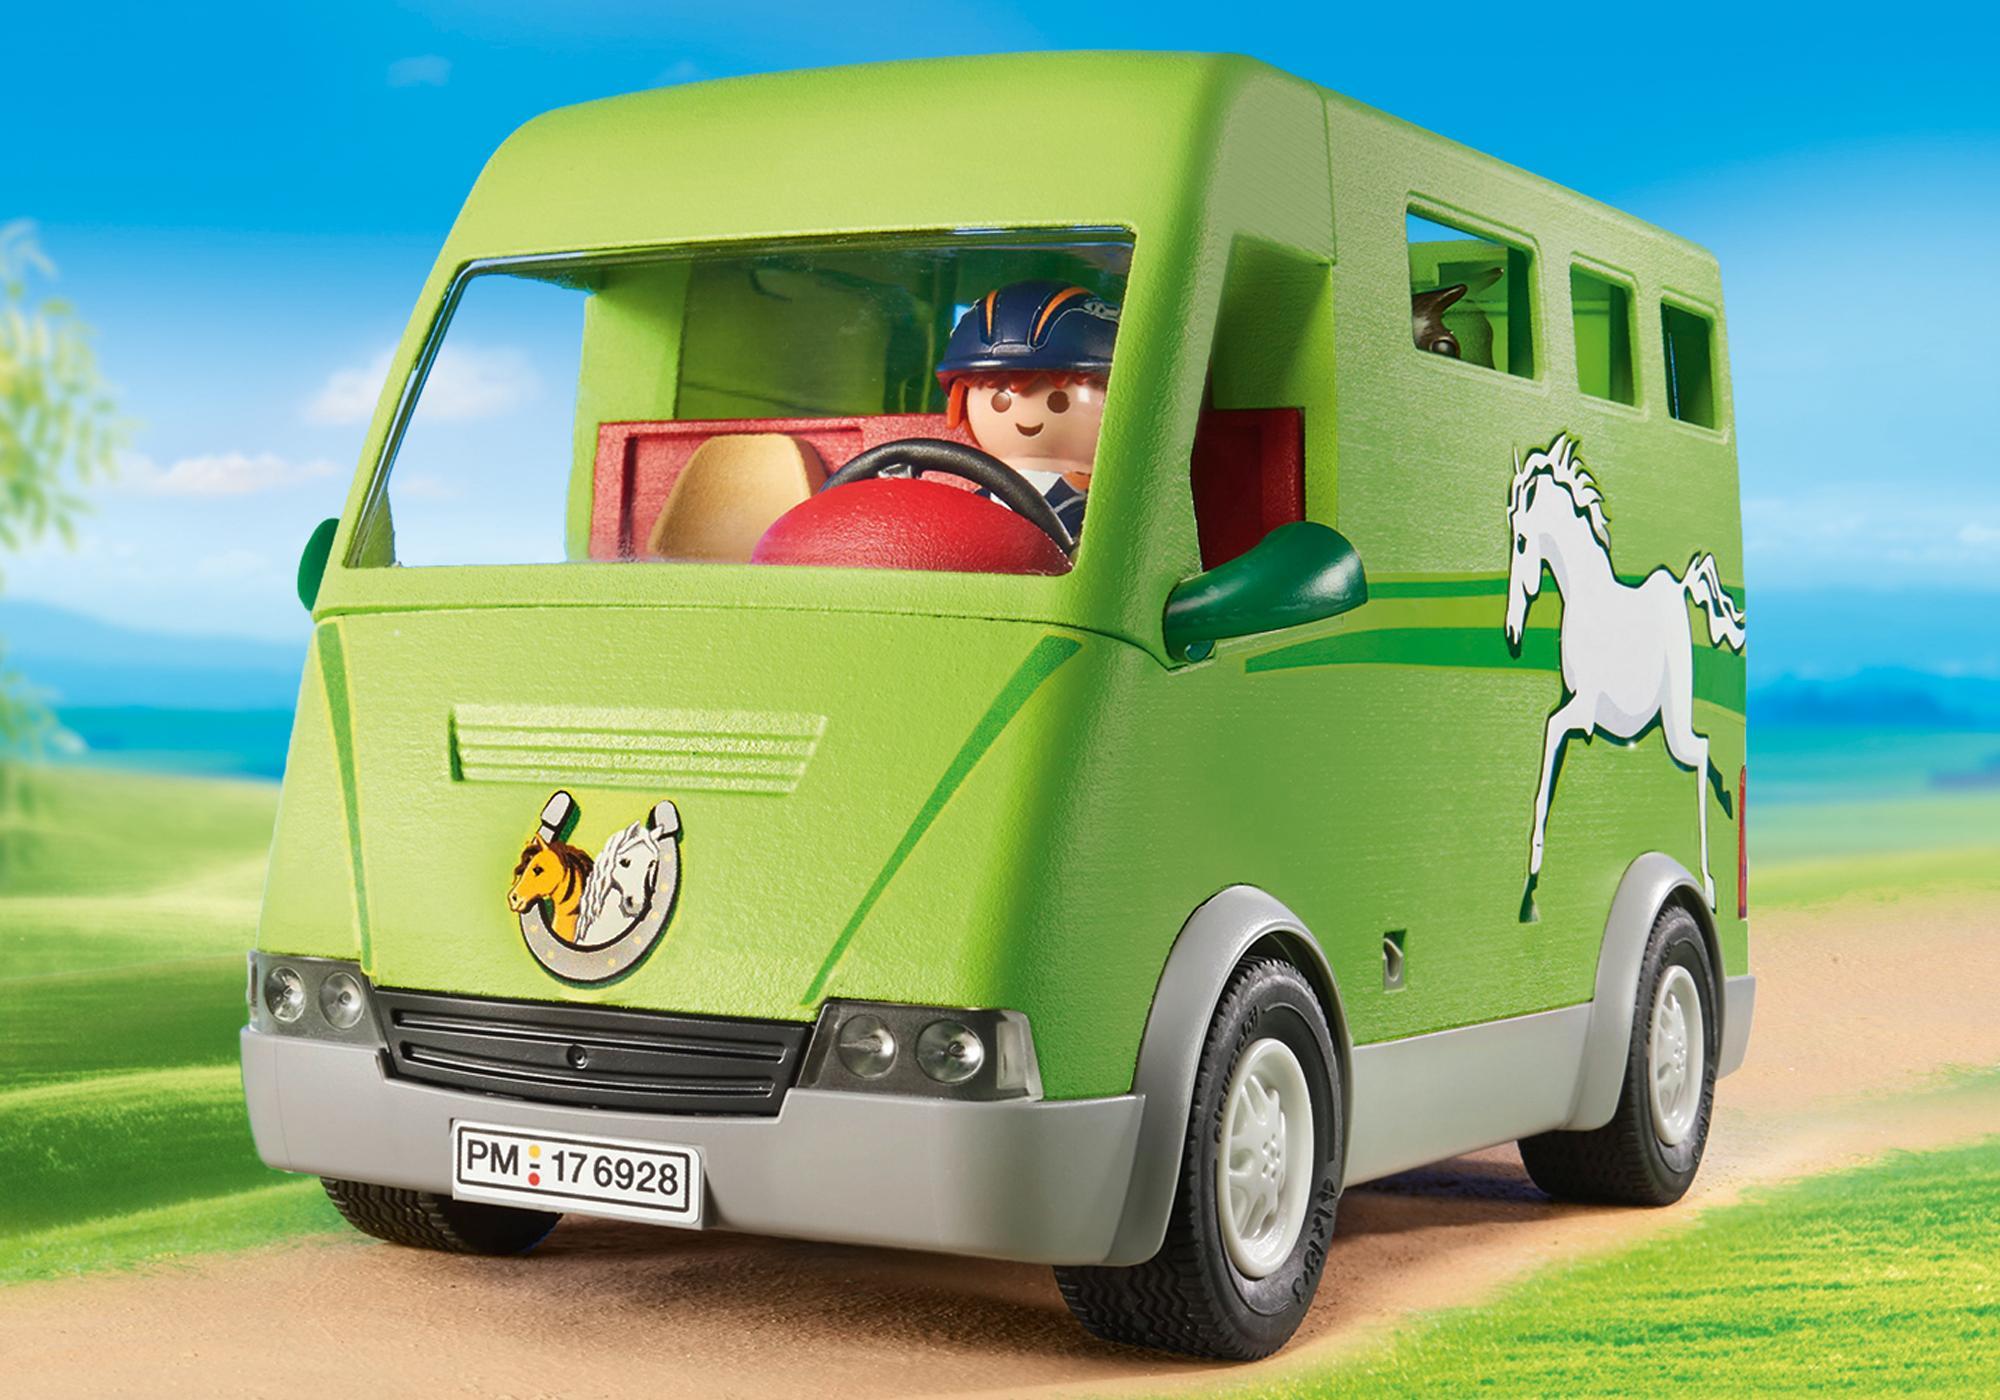 http://media.playmobil.com/i/playmobil/6928_product_extra3/Paardenvrachtwagen